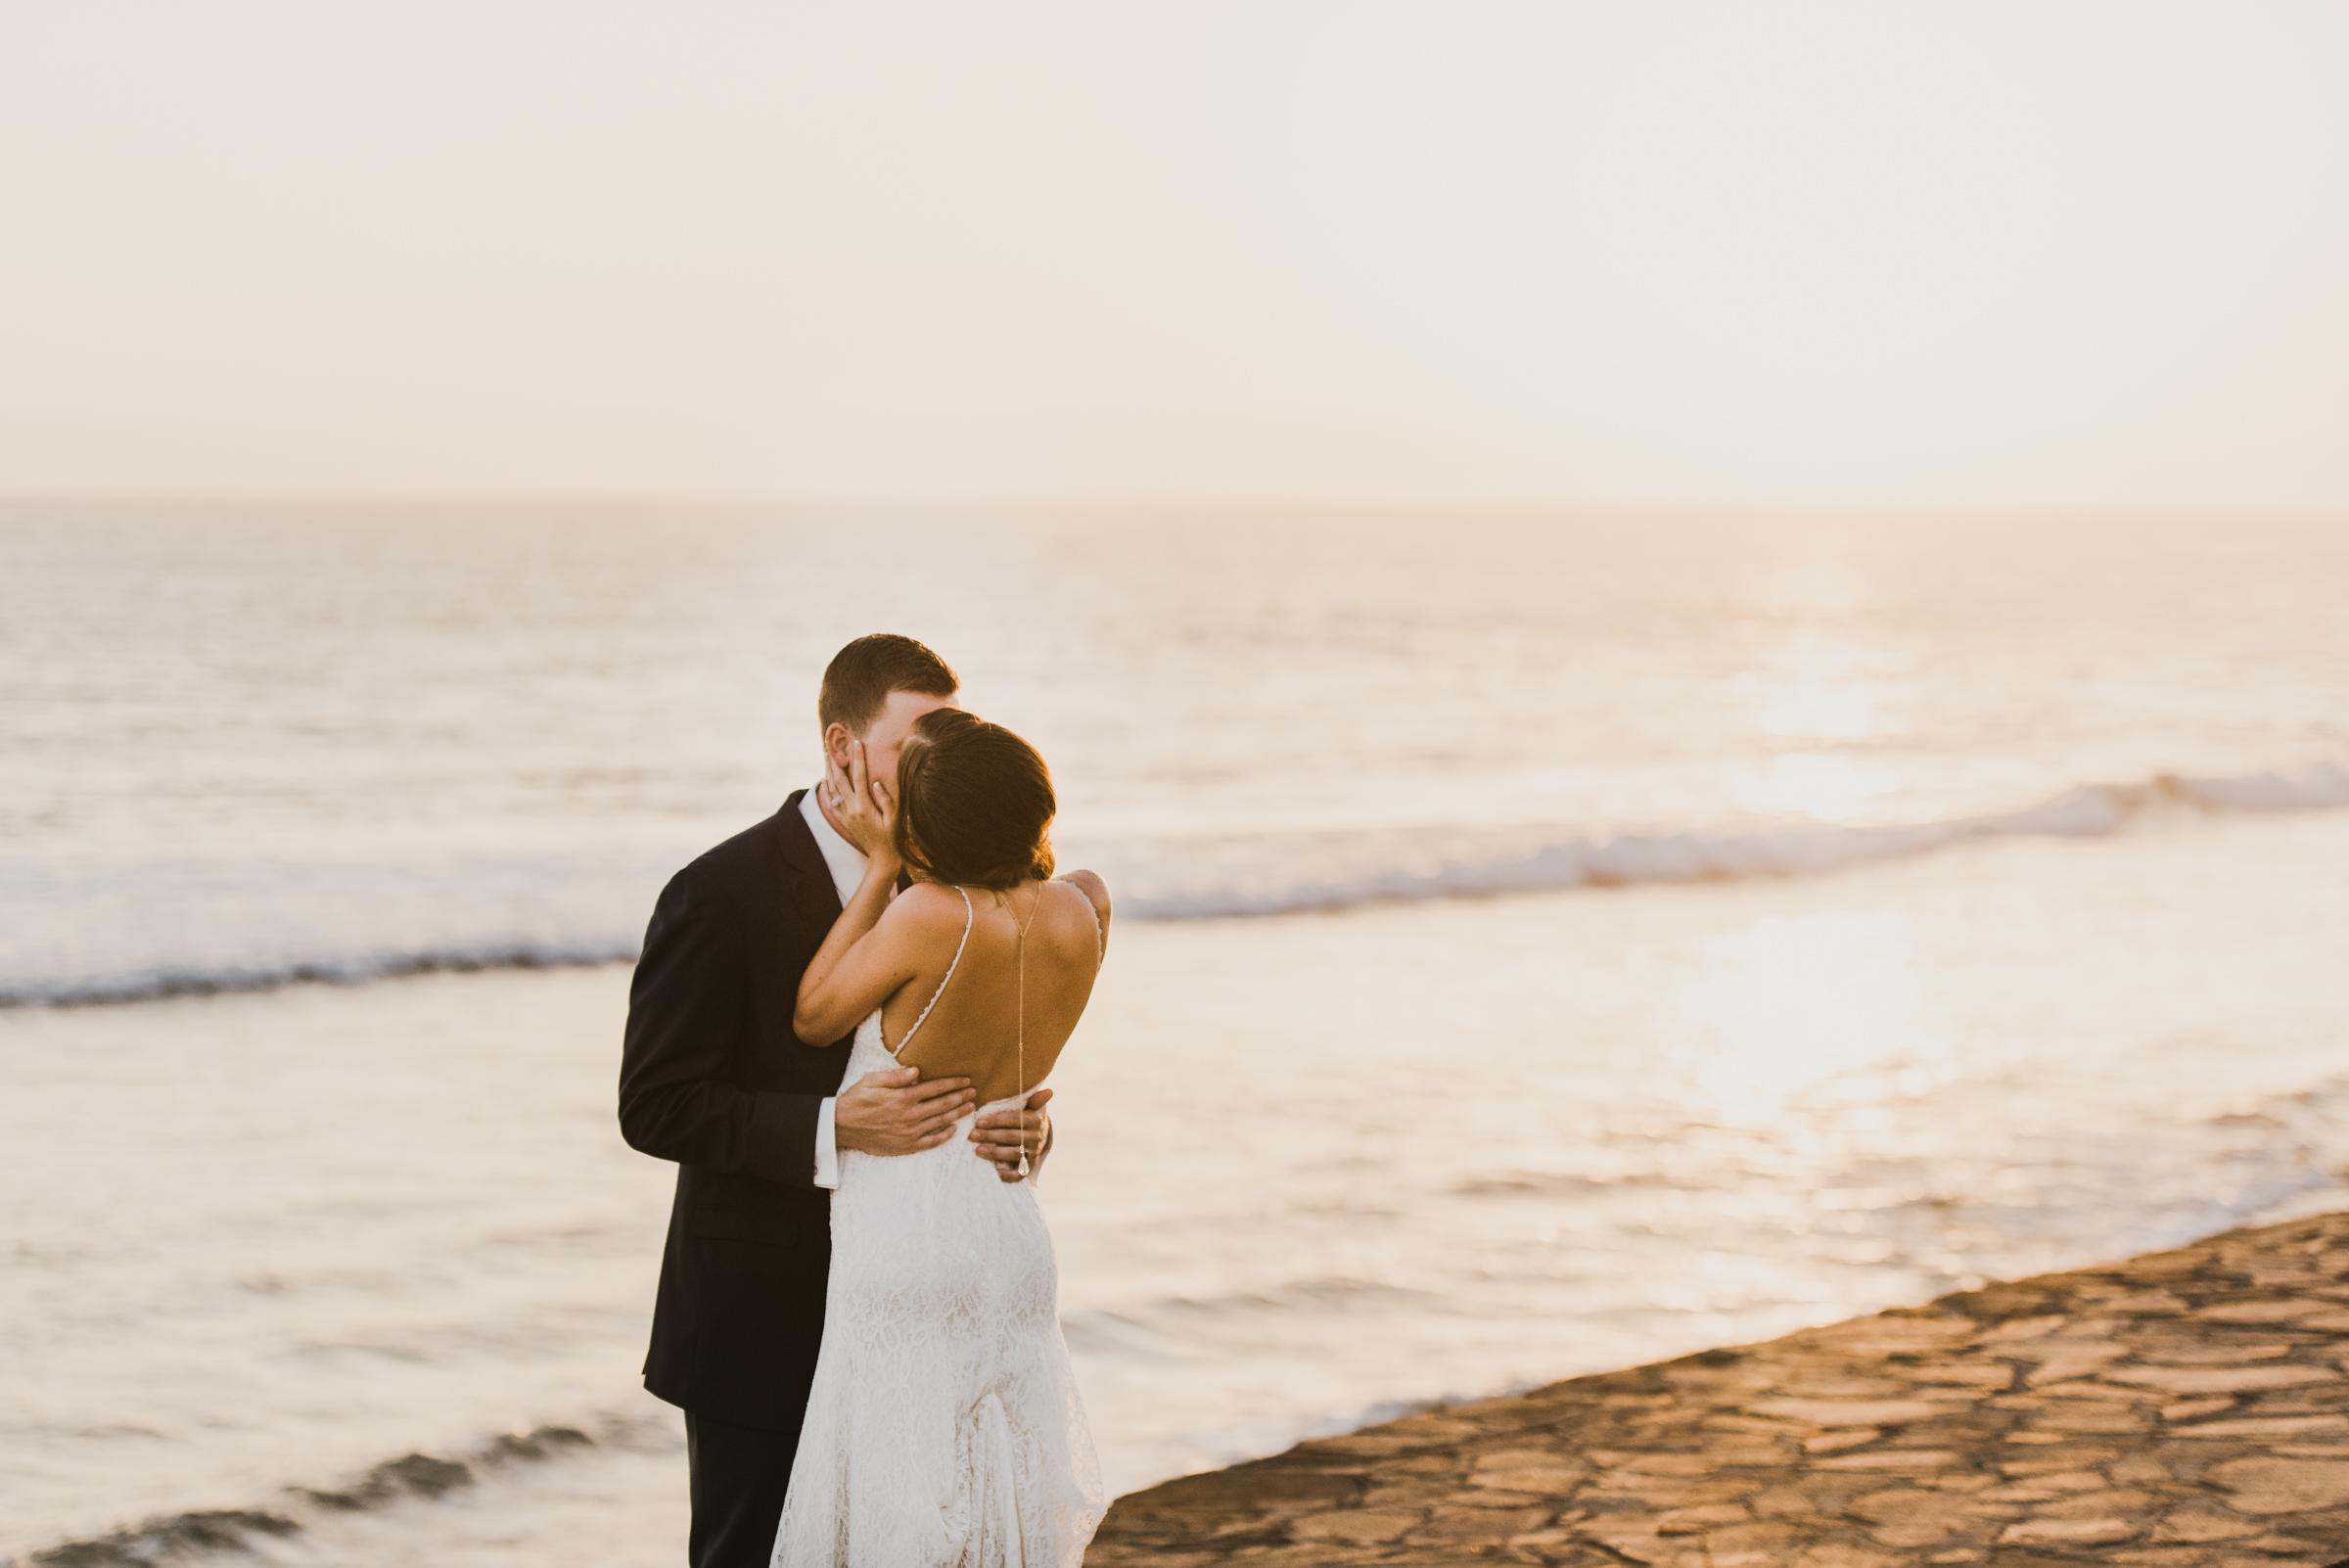 ©Isaiah + Taylor Photography - Rosarito Beach Destination Wedding, Mexico-0087.jpg